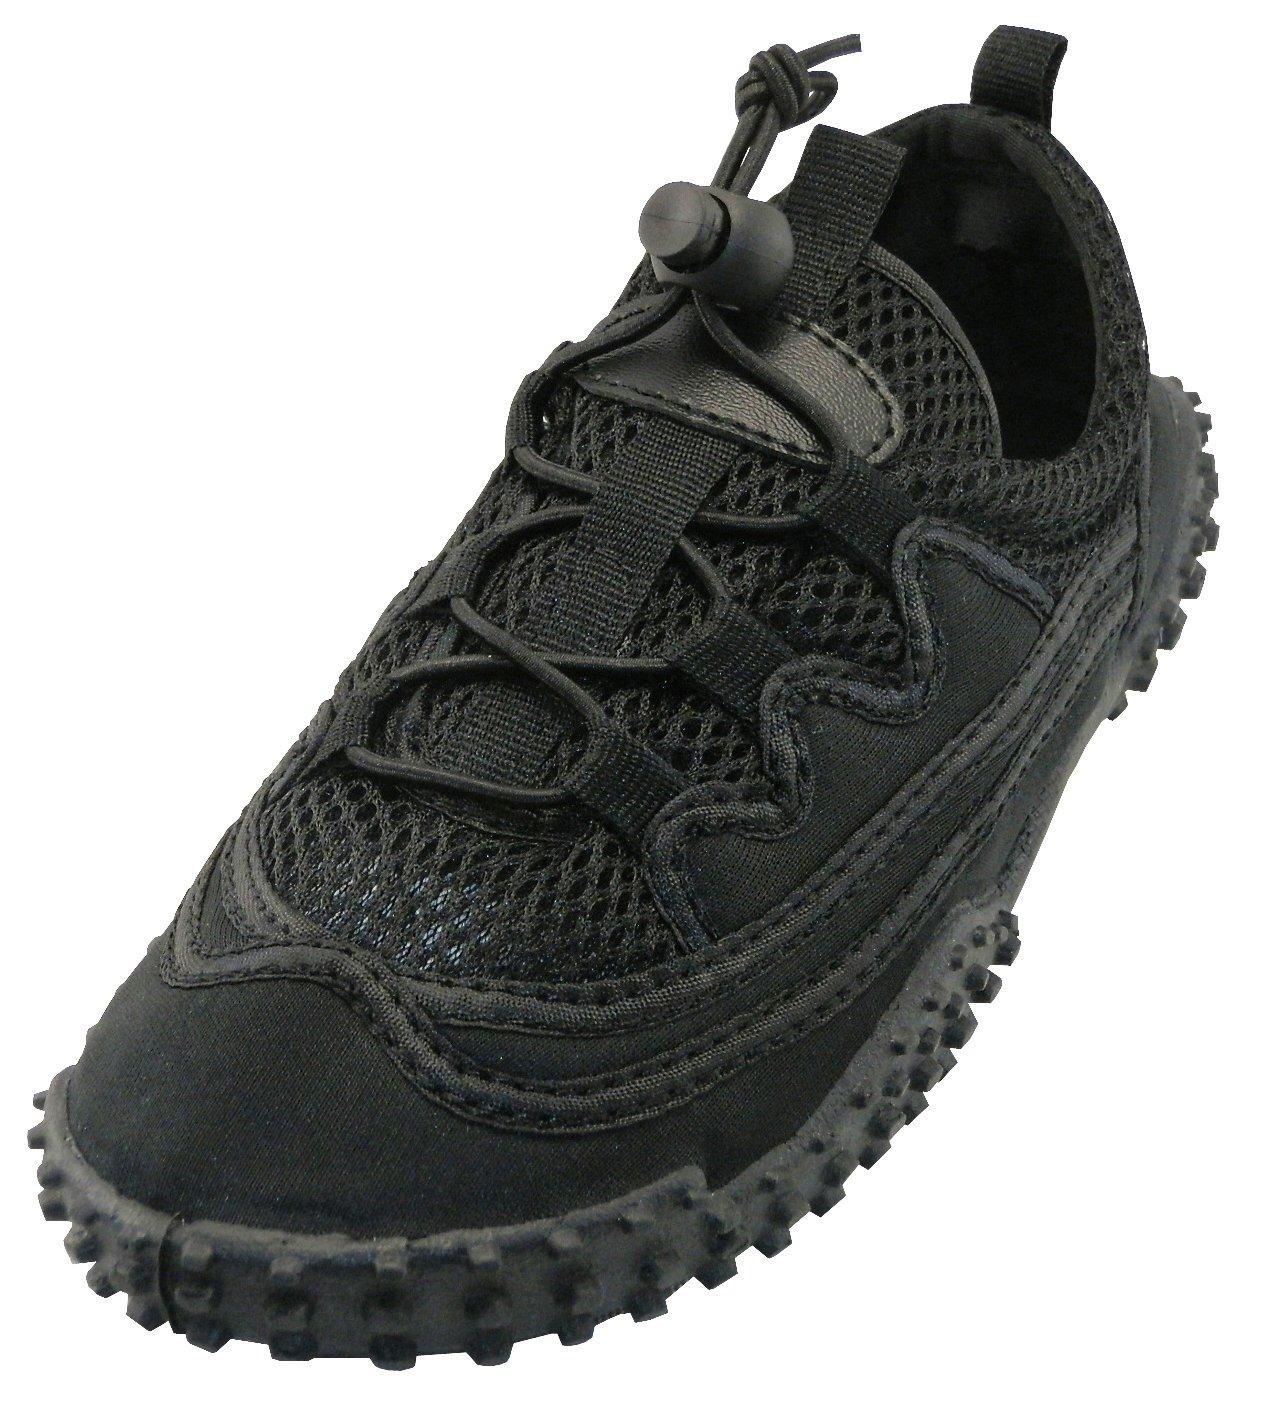 Cambridge Select Women's Lace-up Closed Toe Stretch Elastic Closed Toe Mesh Quick Dry Non-Slip Water Shoe B07B5FW5P5 10 B(M) US|Black/Black